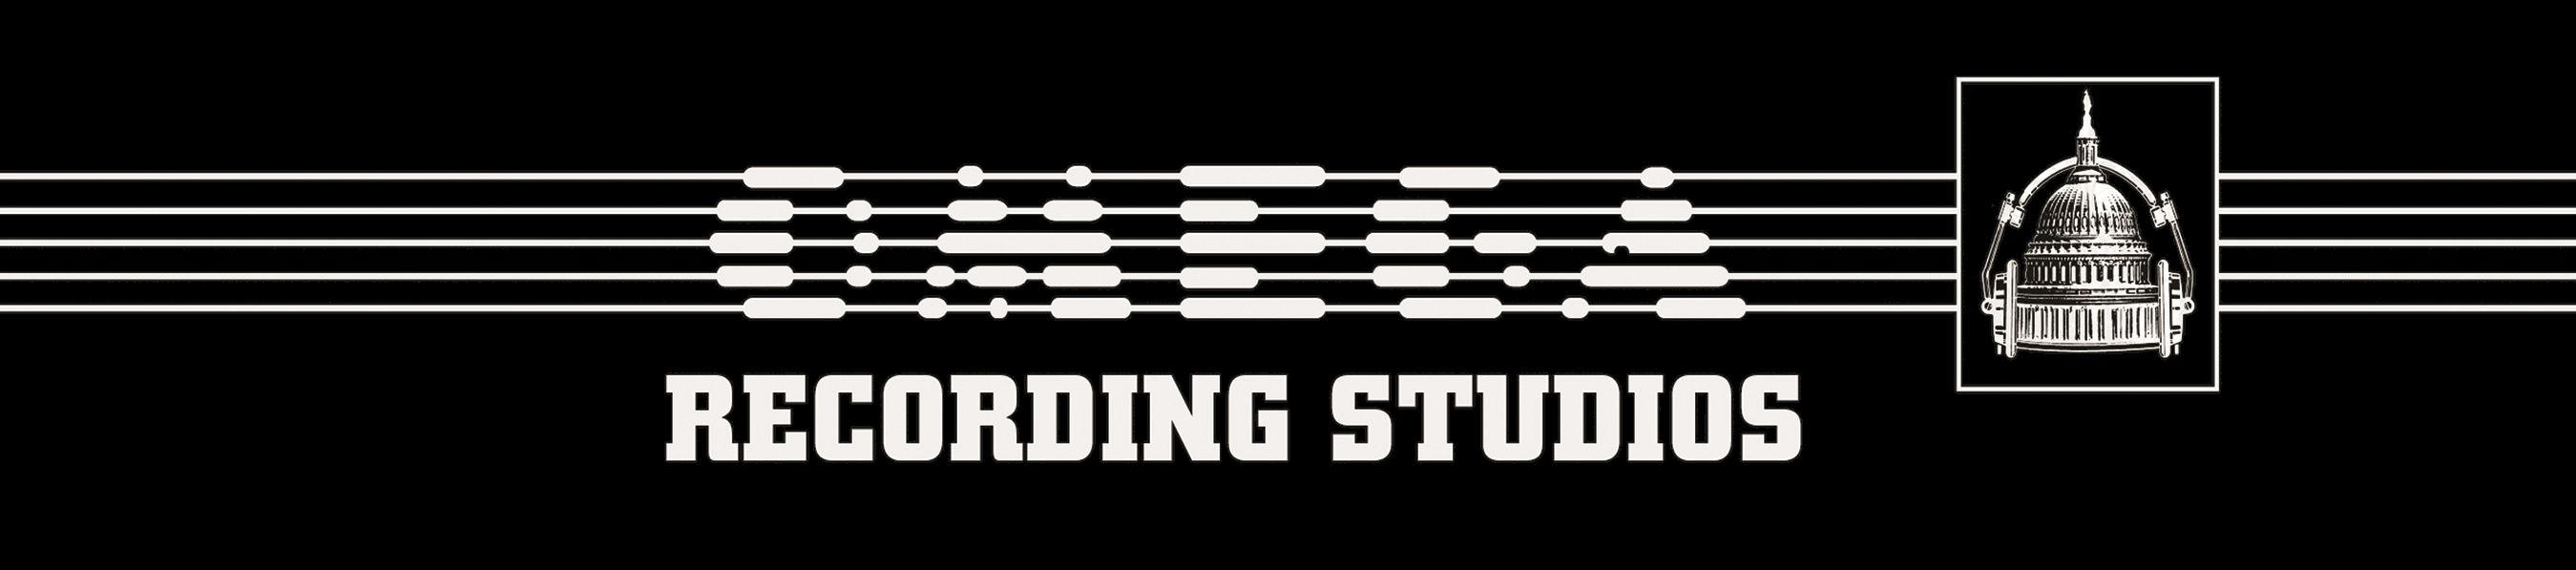 Omega Recording Studios